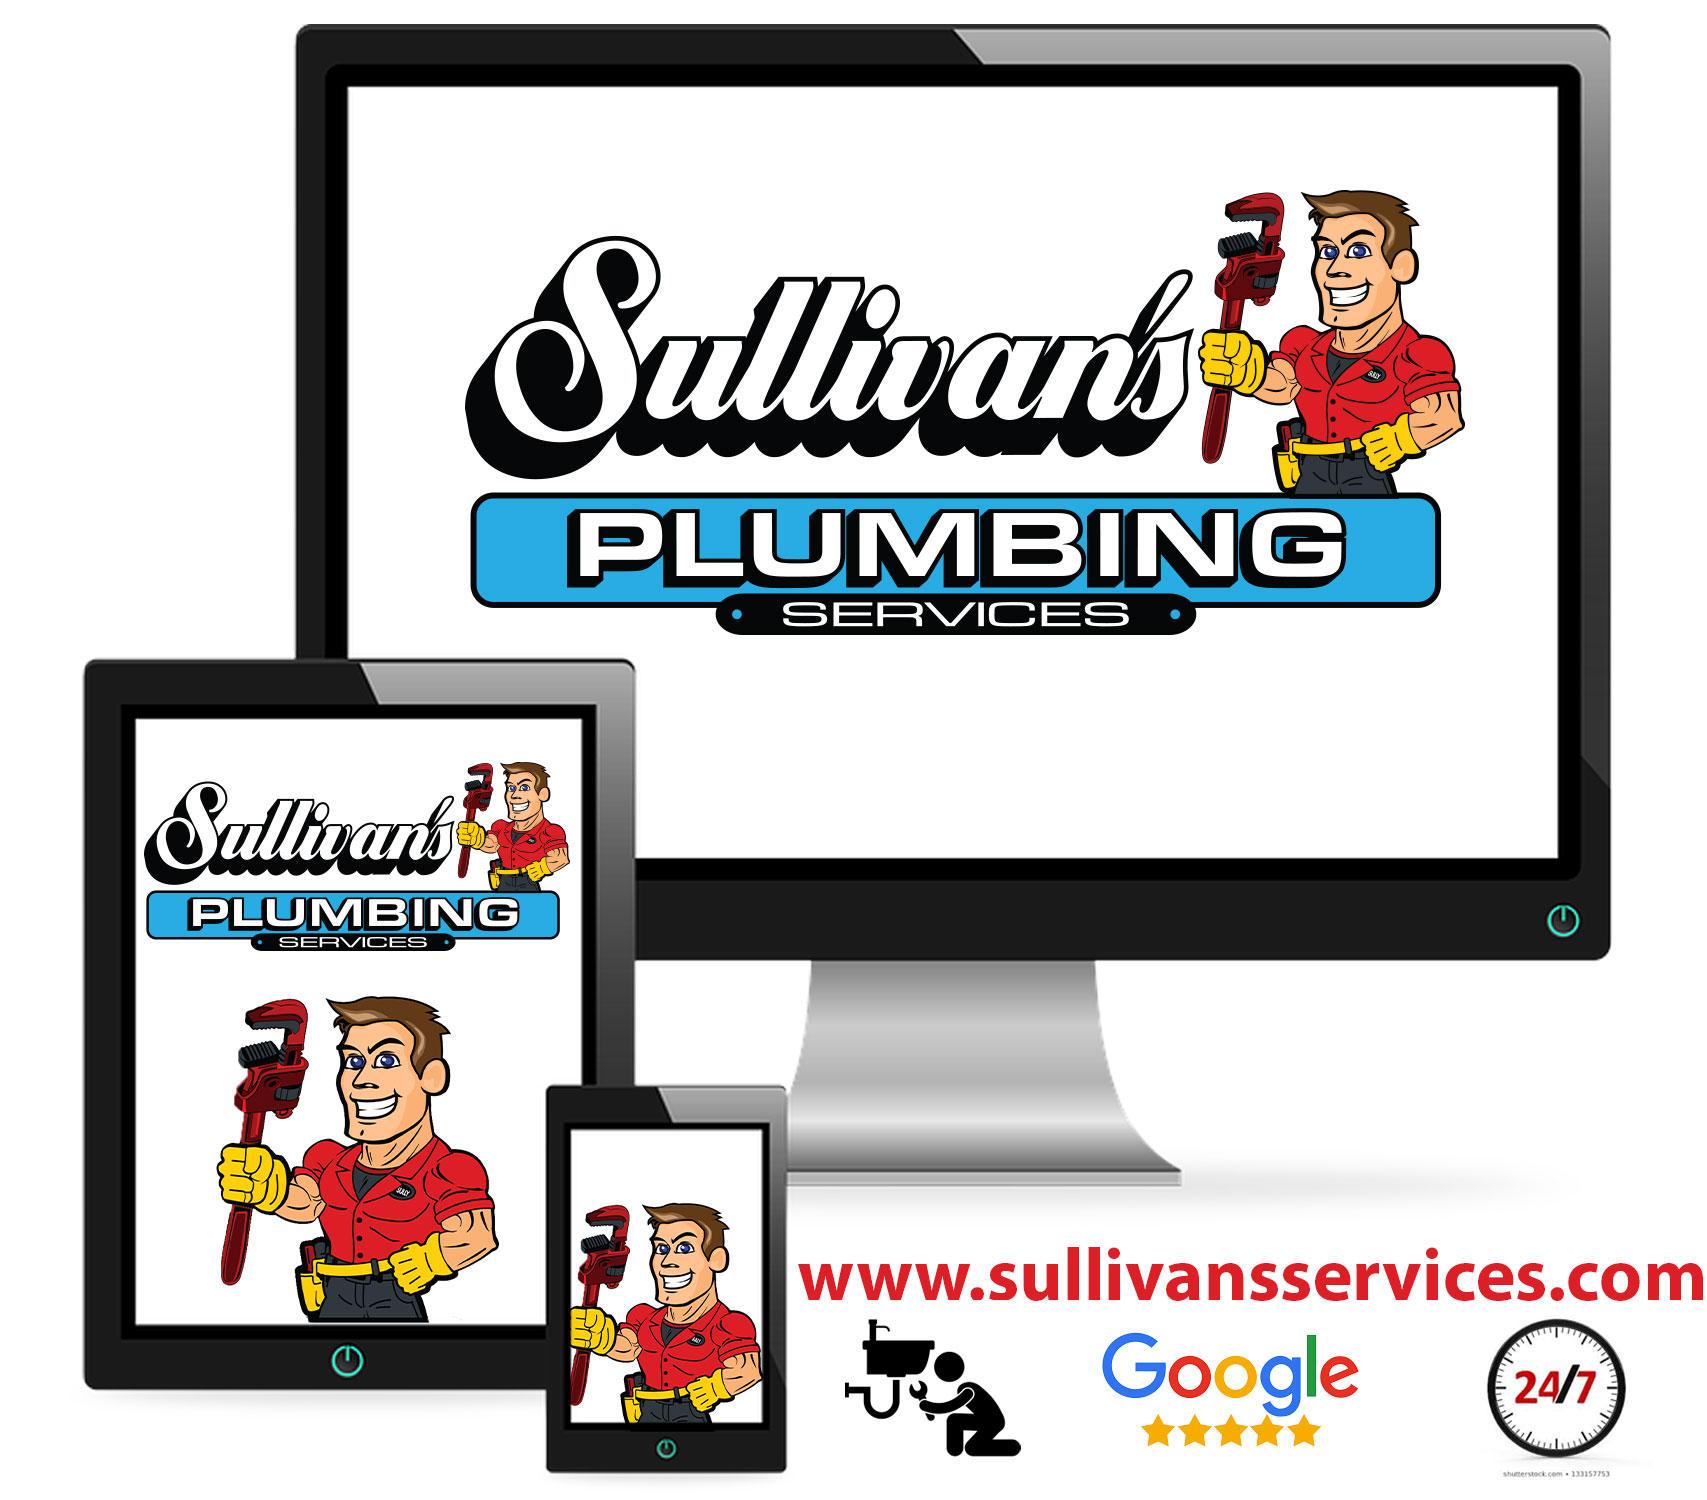 Sullivan's Plumbing Services